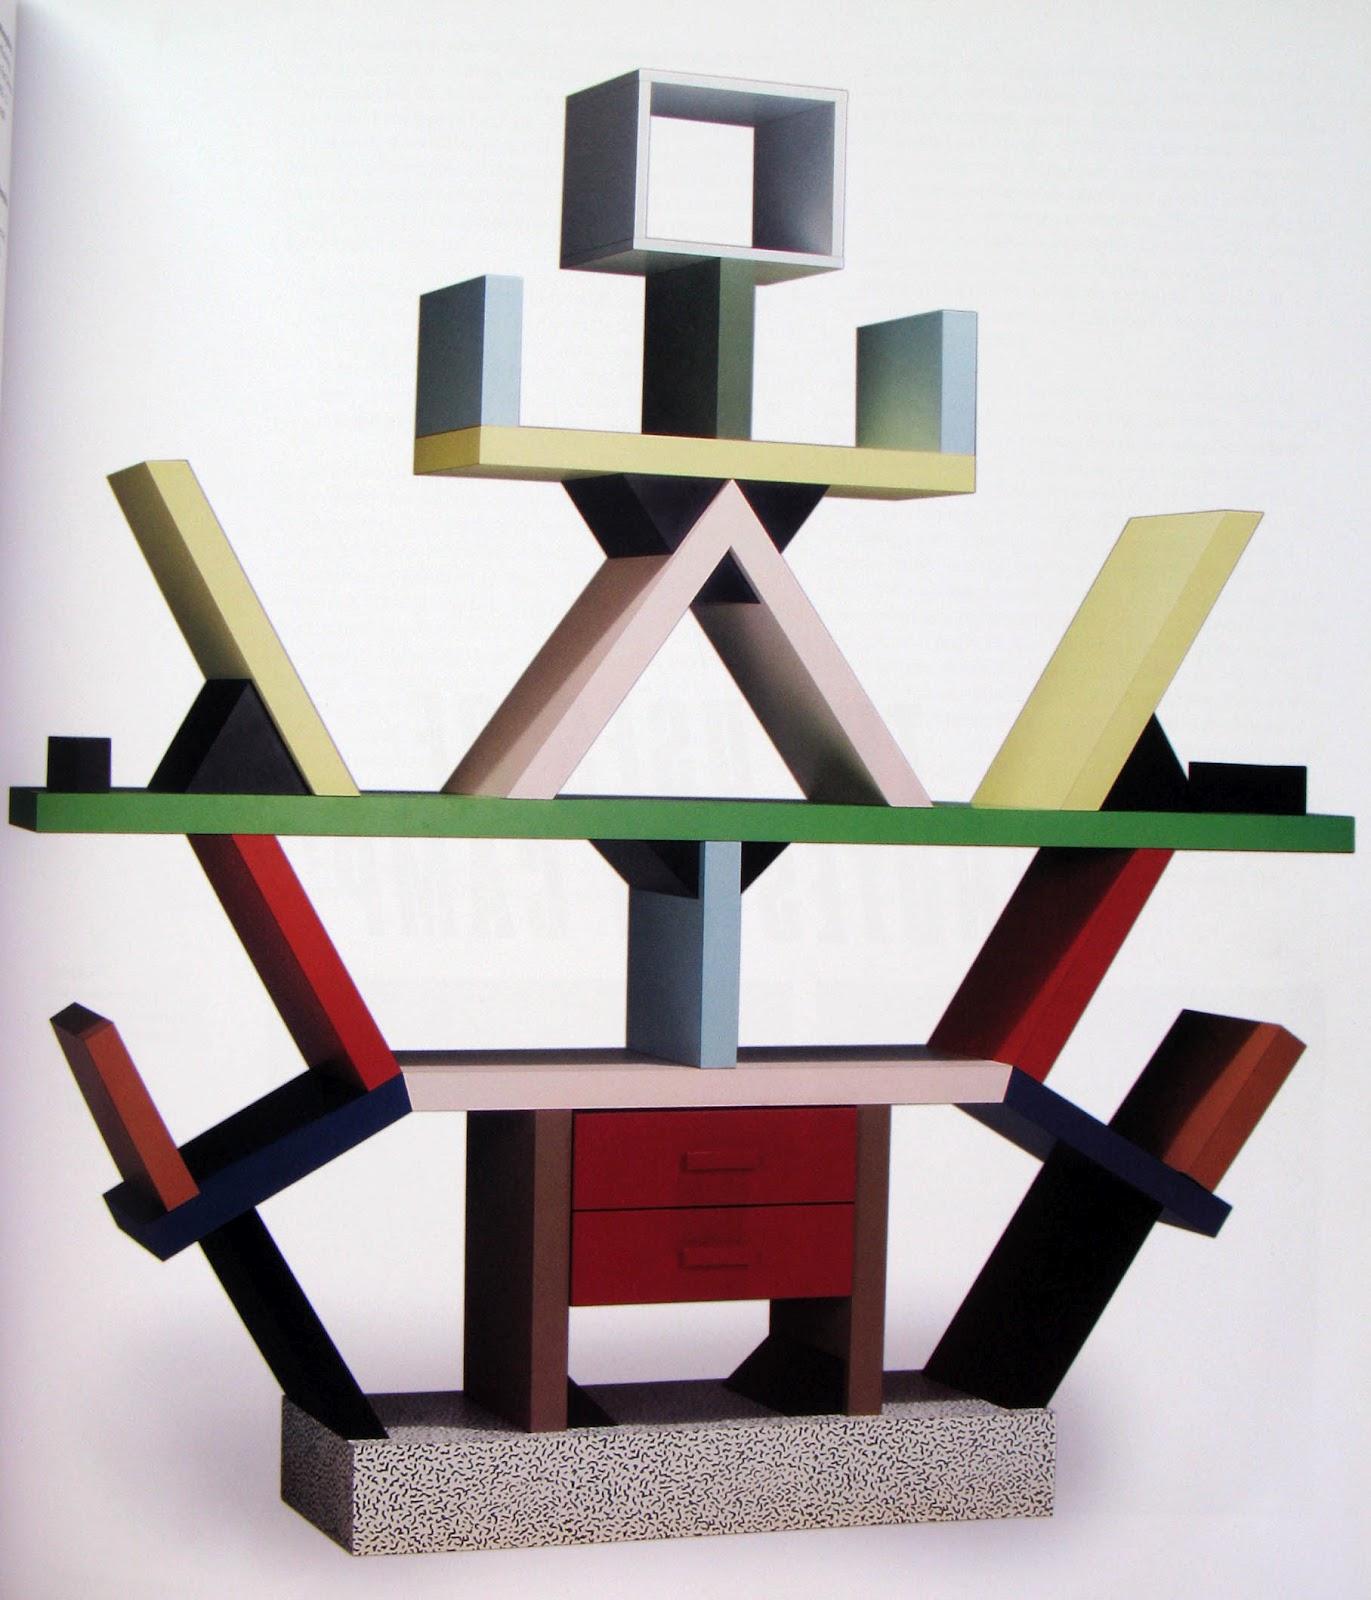 YING ZHANG: Postmodernism